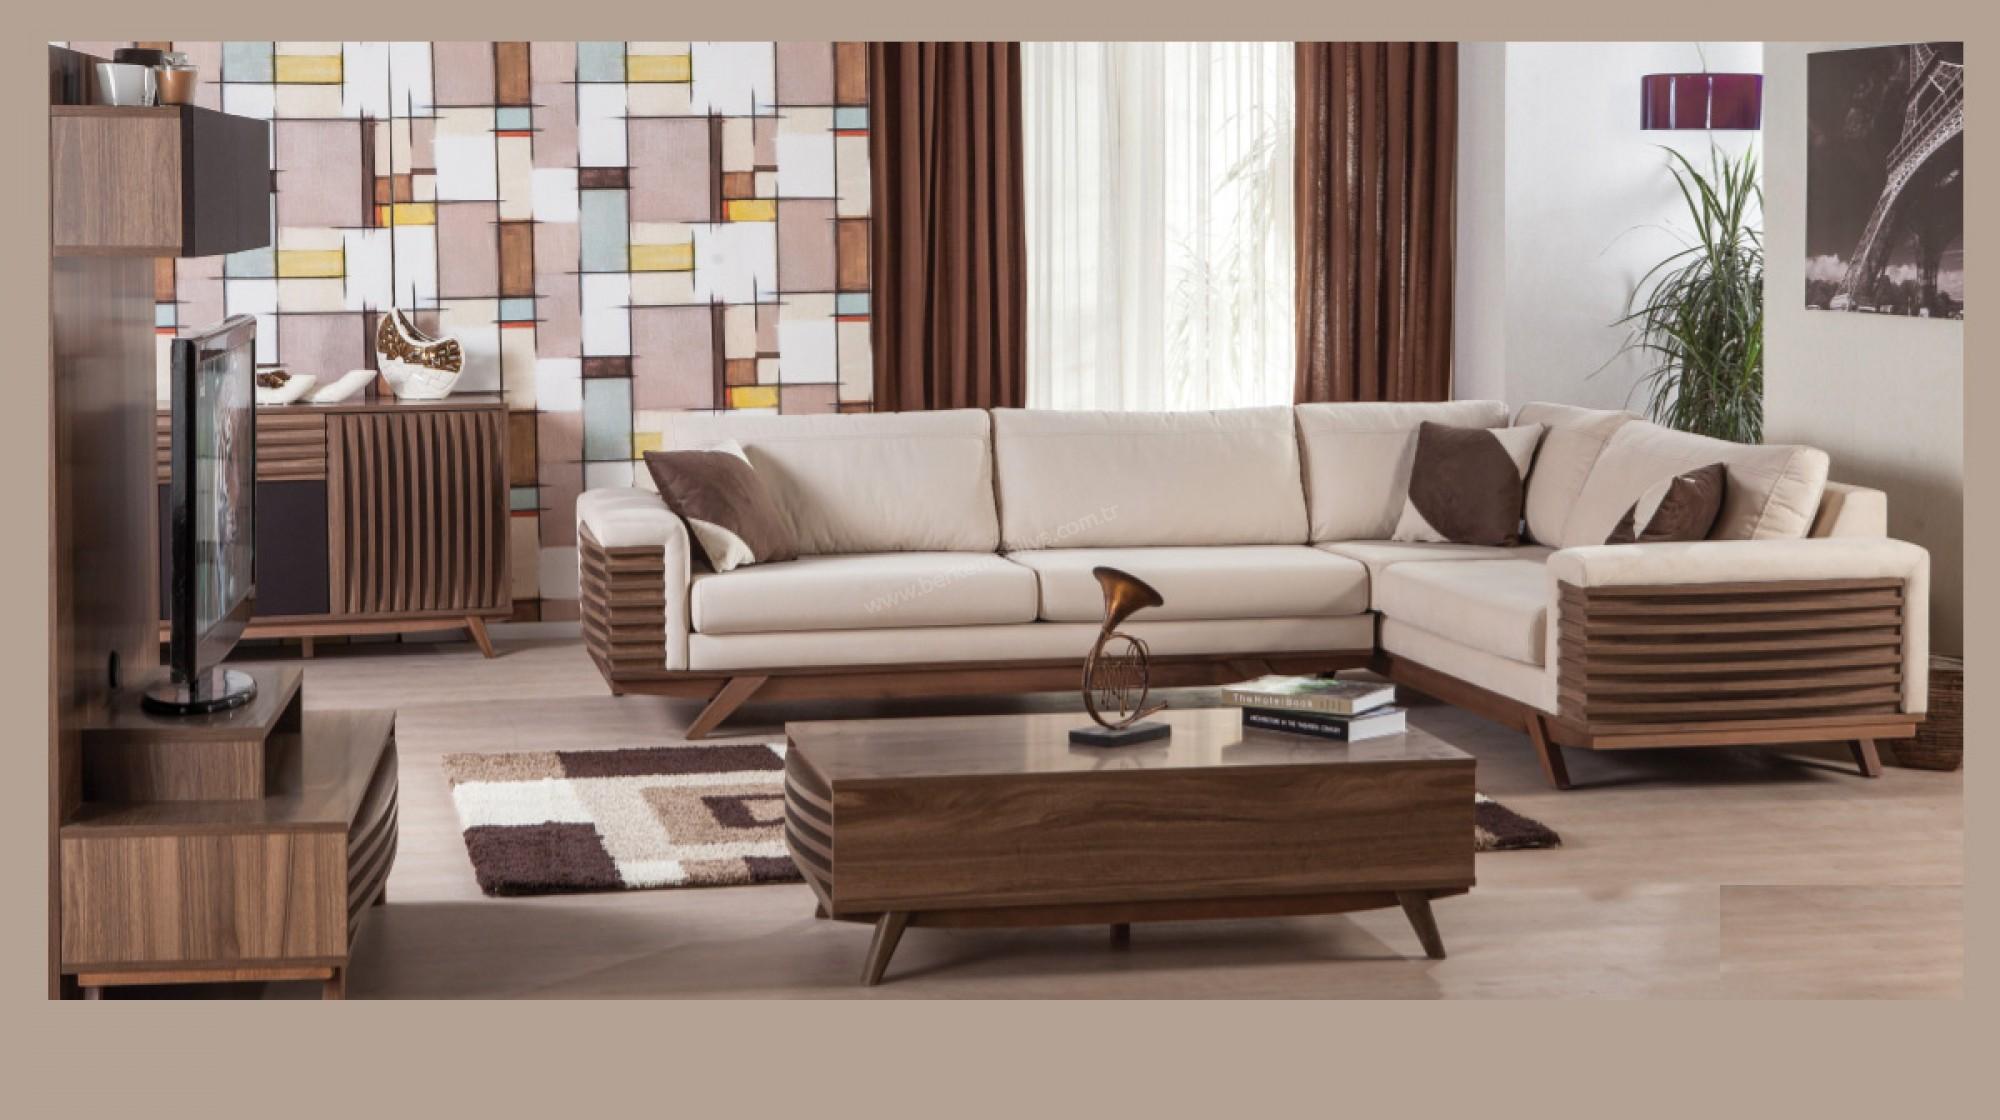 napoli k e koltuk tak m modern k e tak mlar k e tak mlar berke mobilya. Black Bedroom Furniture Sets. Home Design Ideas